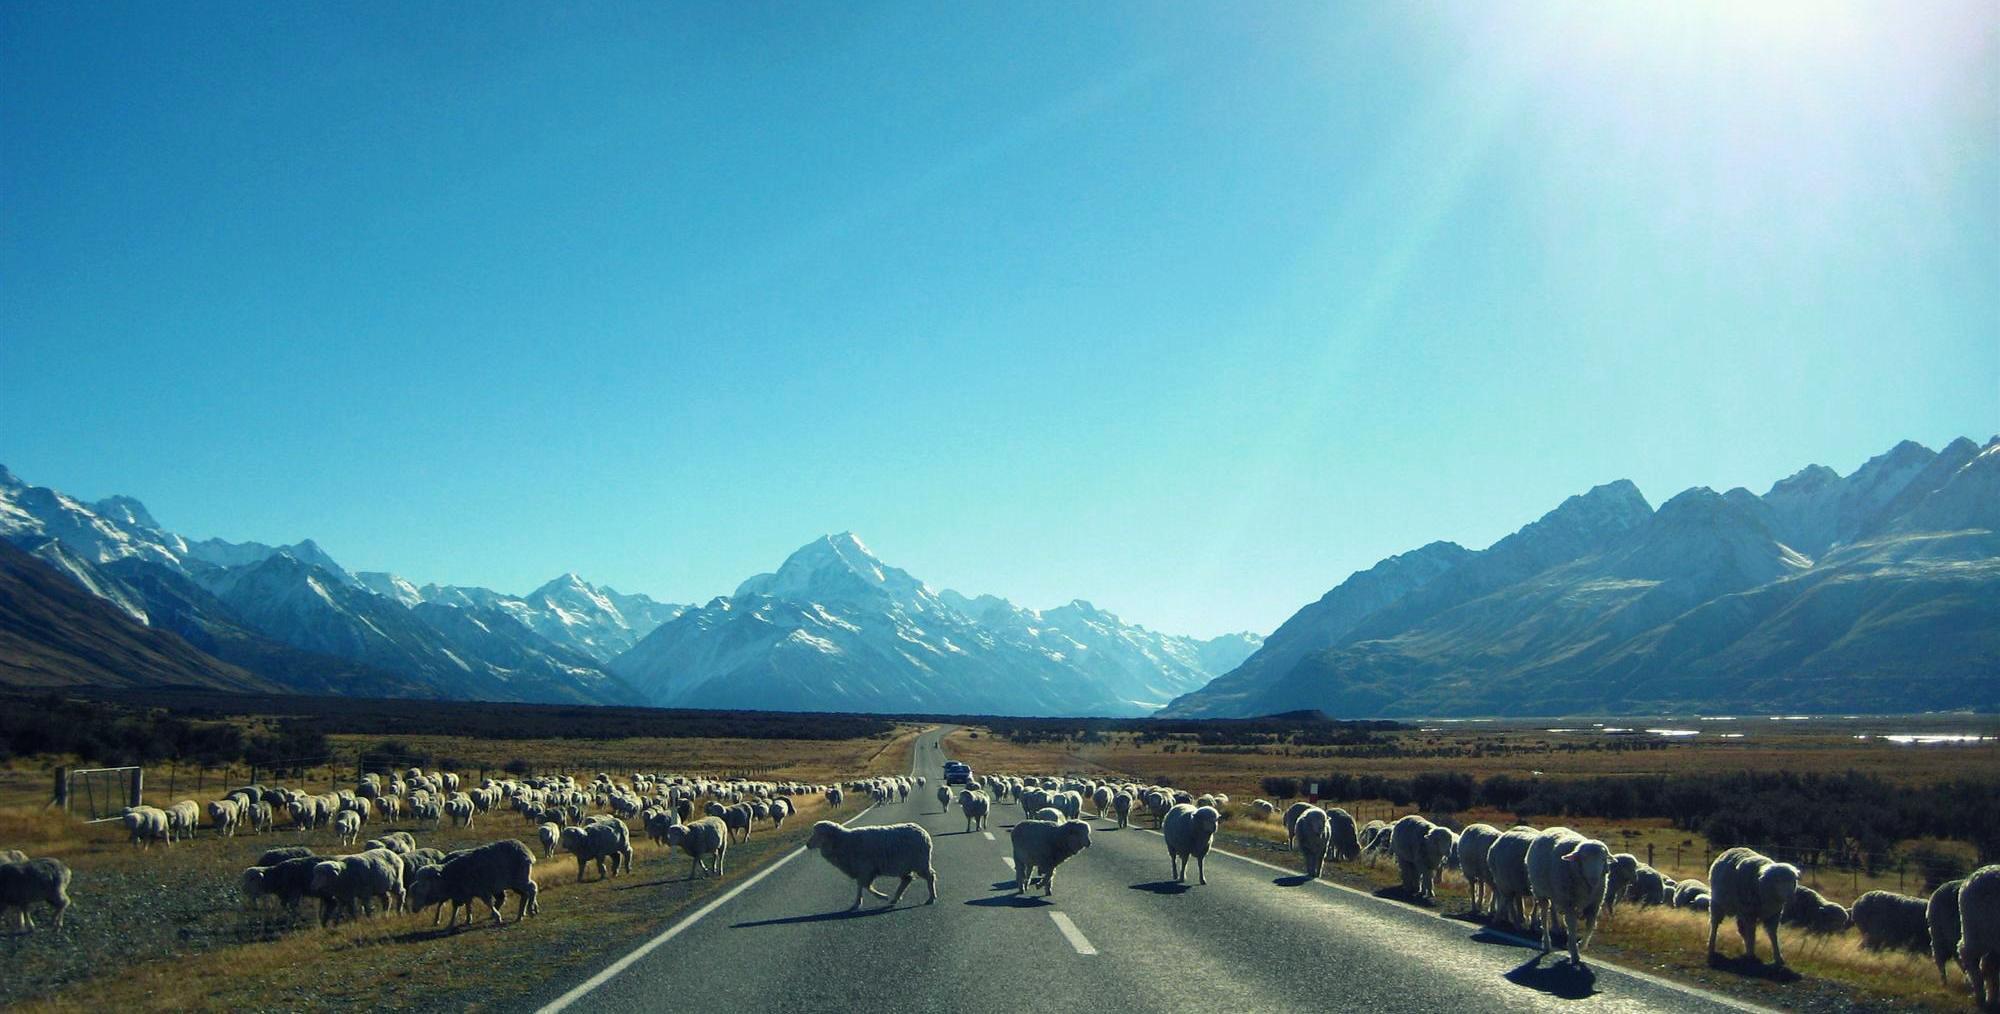 Sheep - Mt. Cook - New Zealand